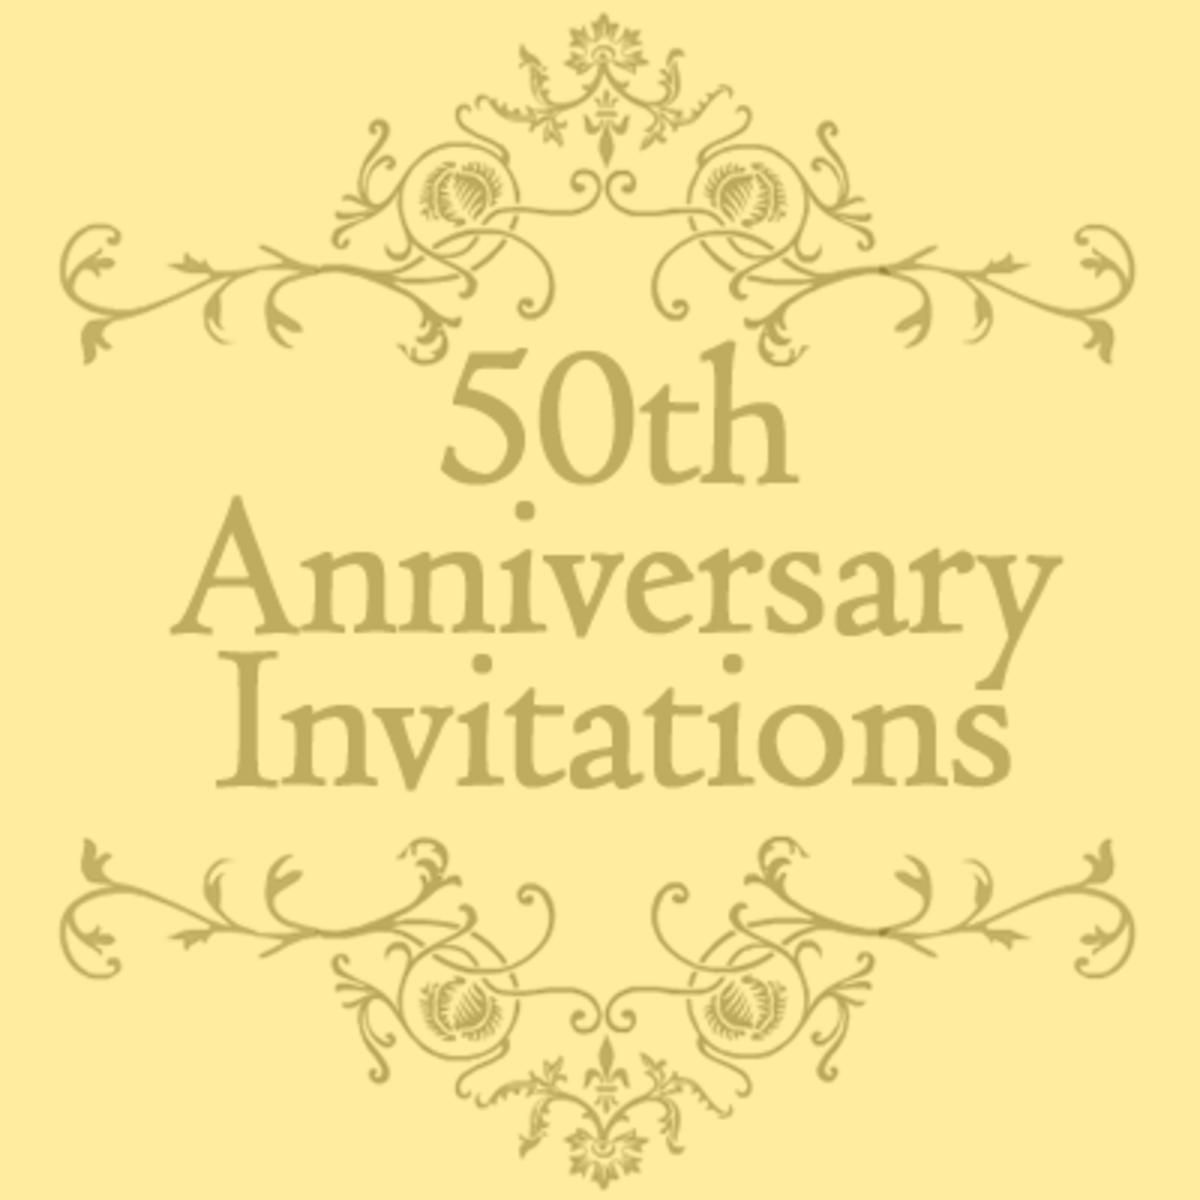 free 50th wedding anniversary invitations templates | hubpages, Invitation templates